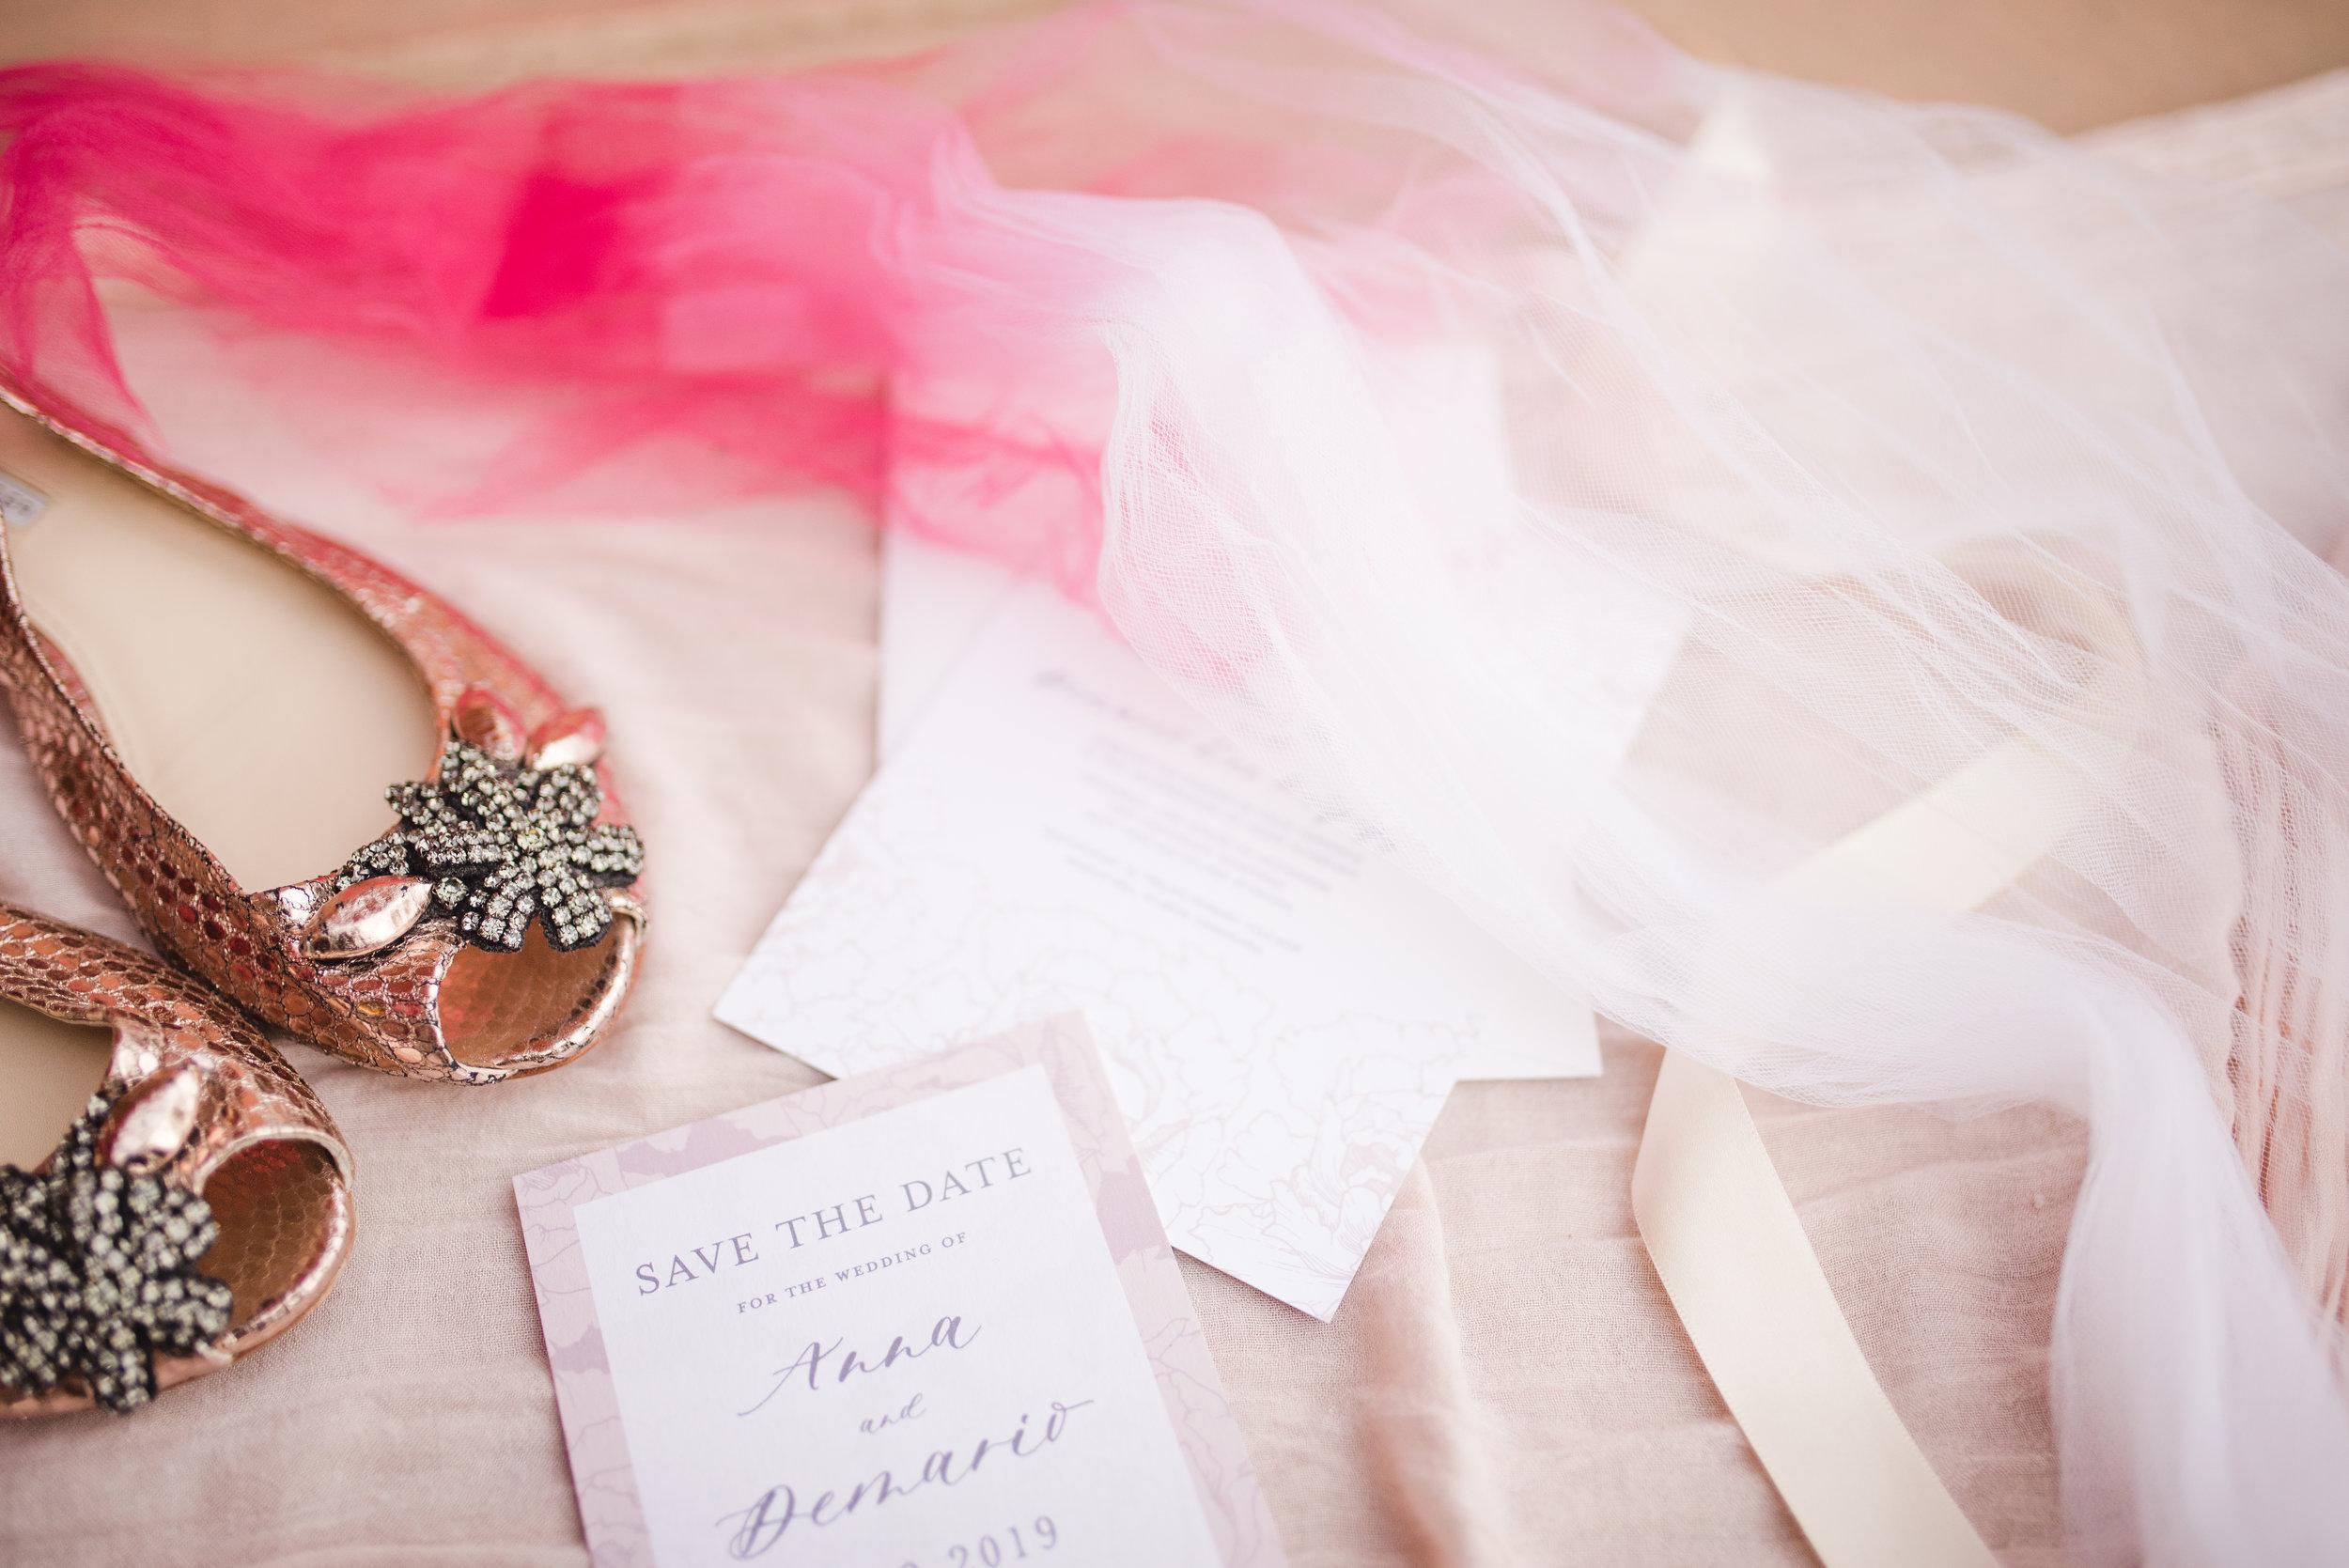 Anna Hand Drawn Wedding Invitation Pink Peonies Feathered Heart PrintsButterfly Garden (160 of 187).jpg